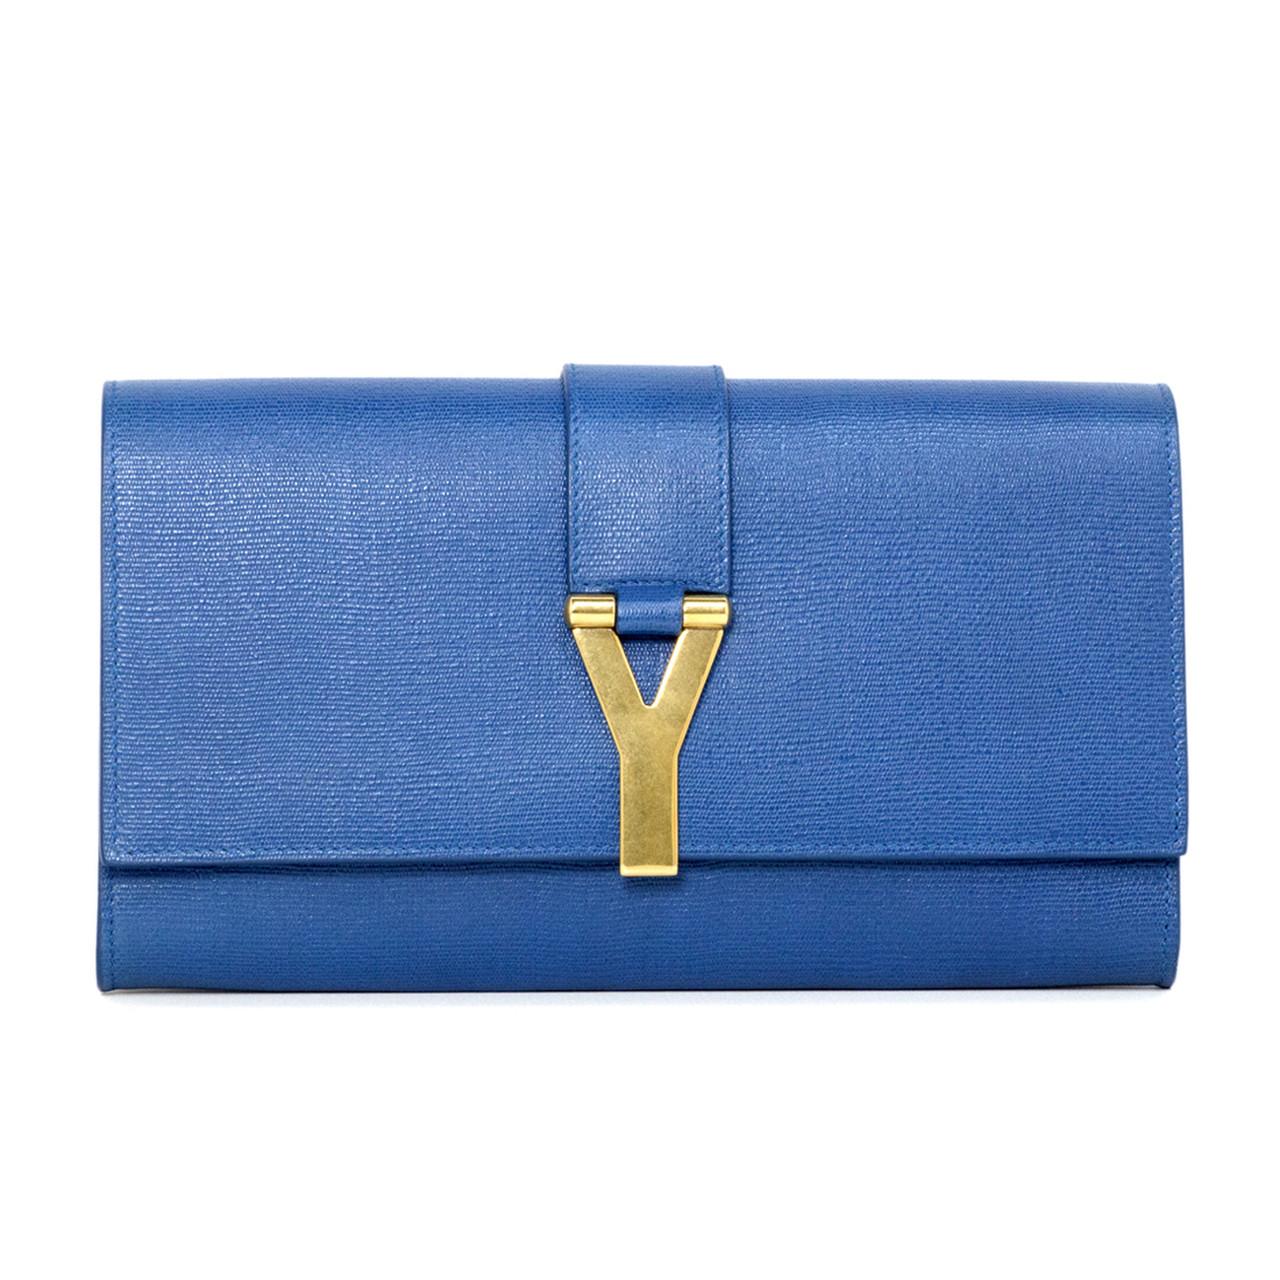 50f8bdc779b Ysl saint laurent blue textured calfskin classic clutch modaselle jpg  1280x1280 Ysl blue